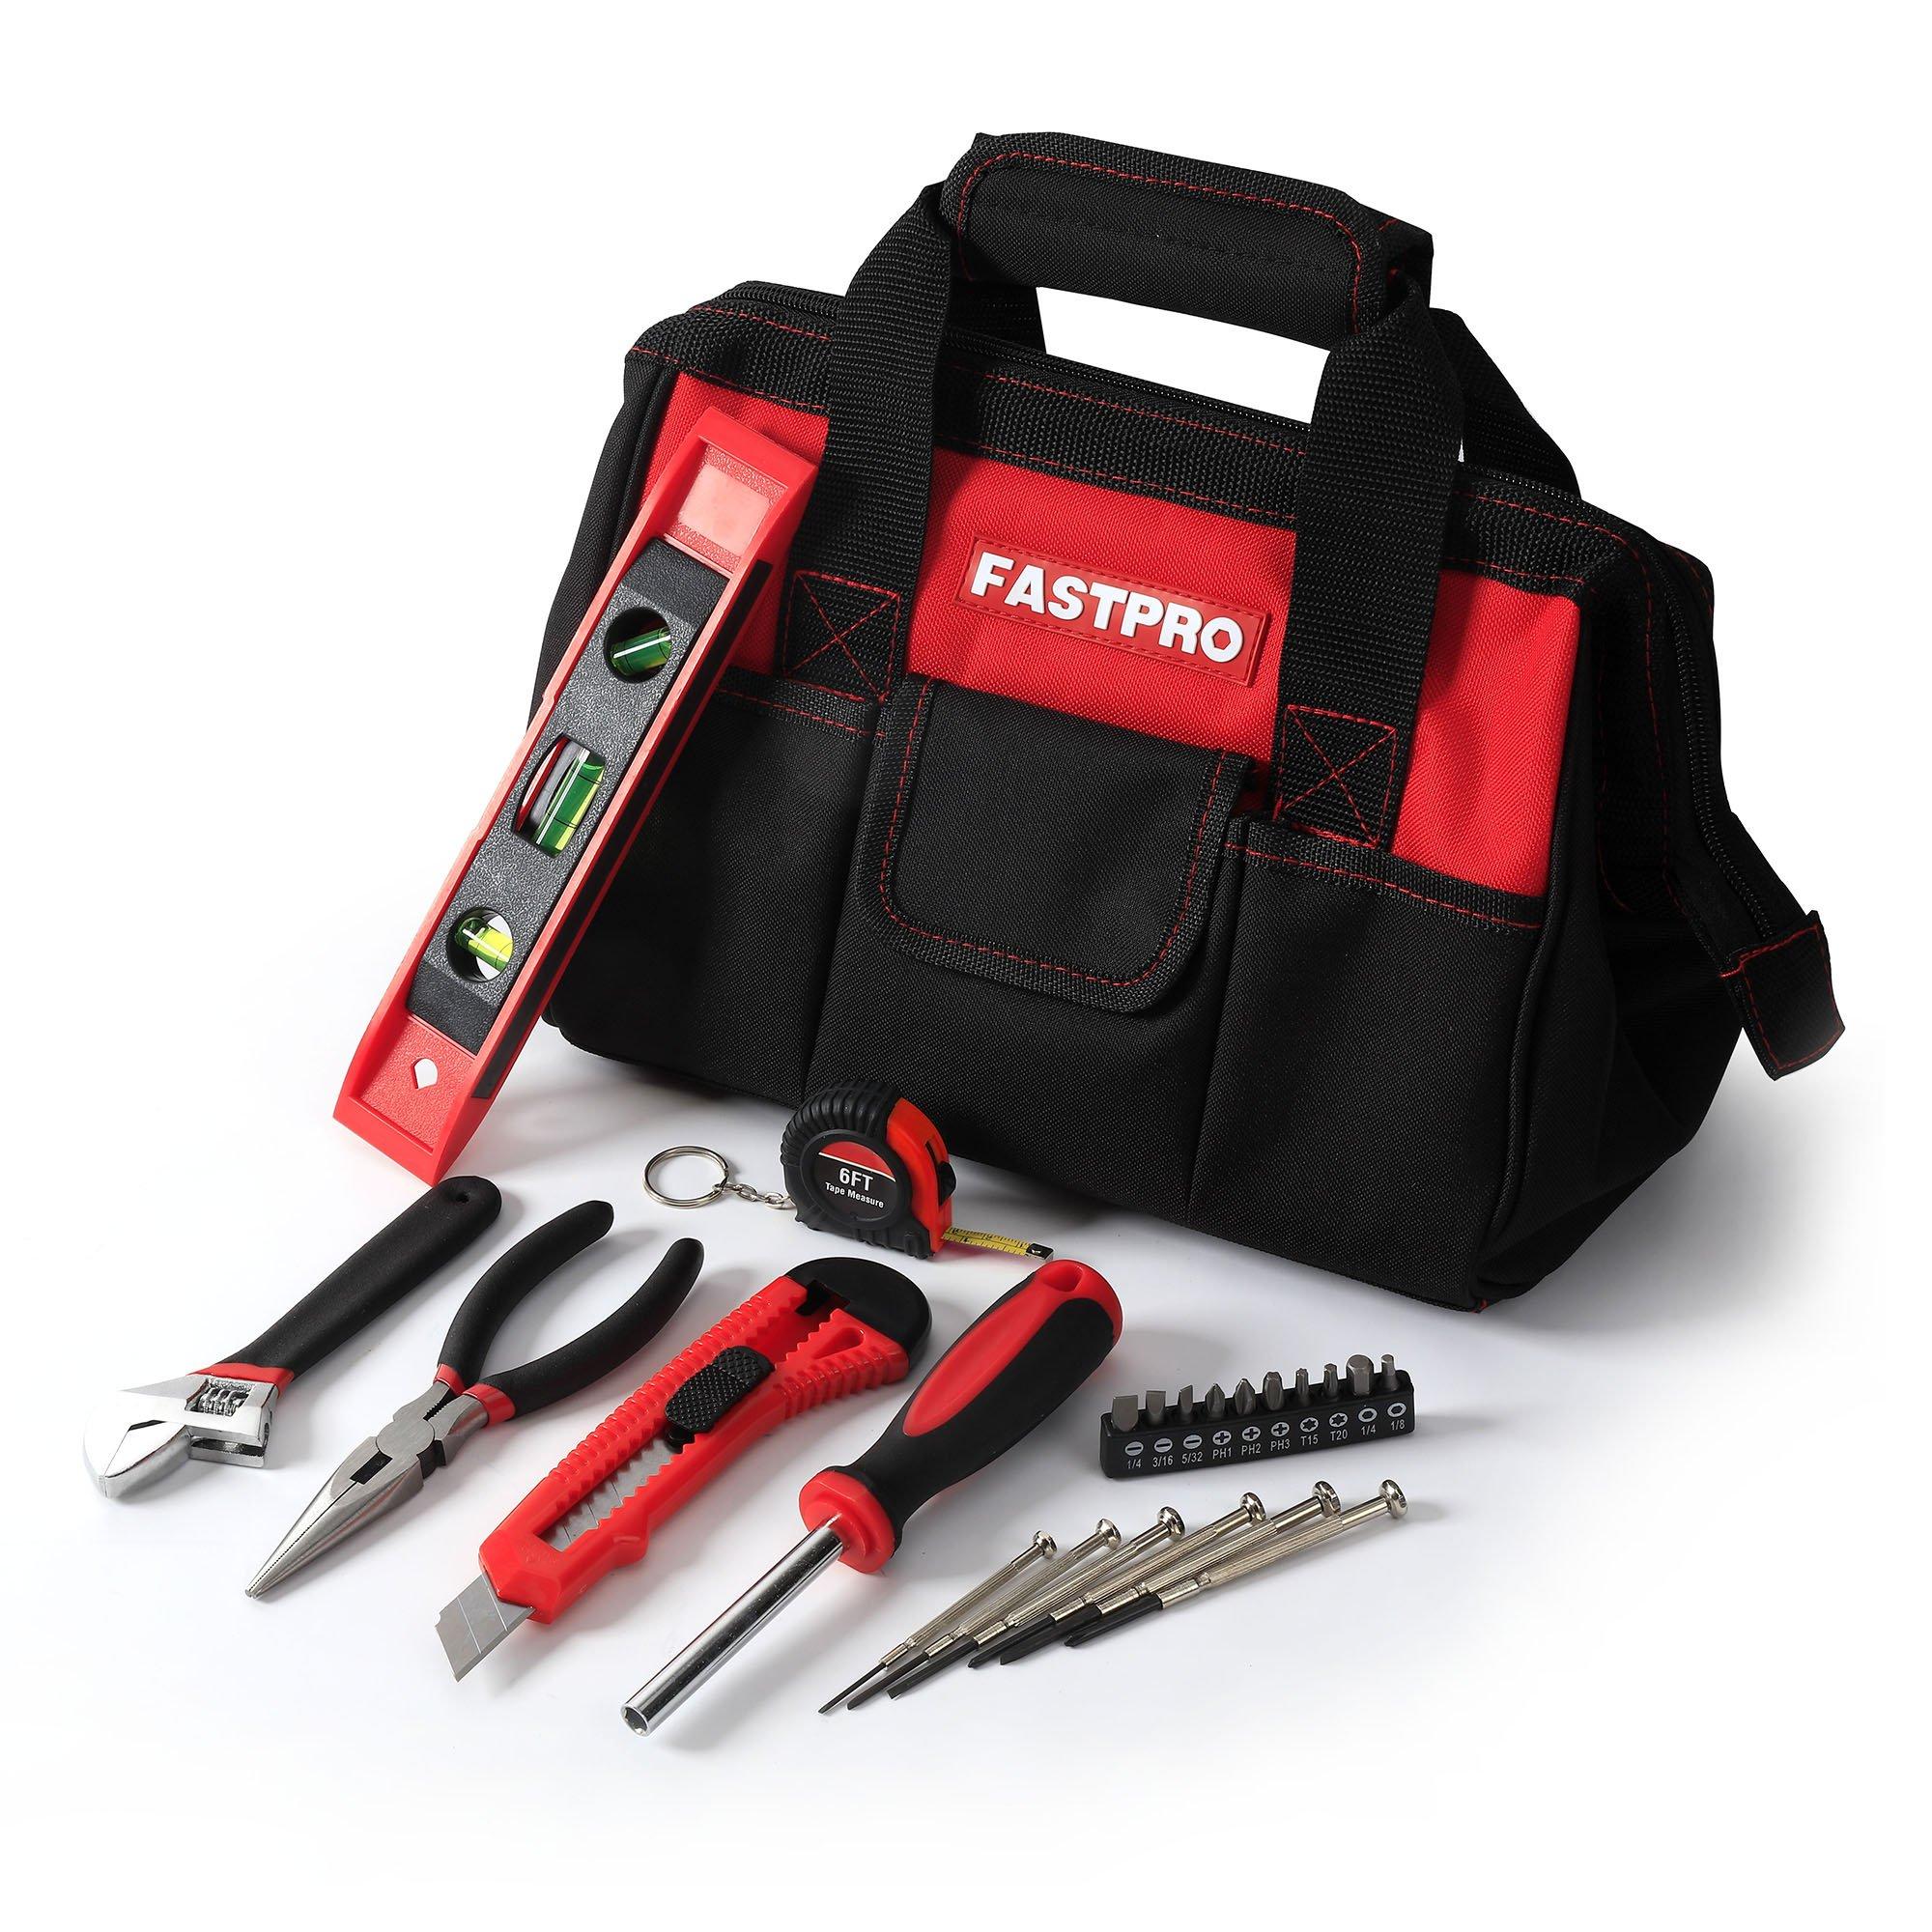 FASTPRO 23-piece Basics Tool Set with Tool Bag by FASTPRO (Image #2)